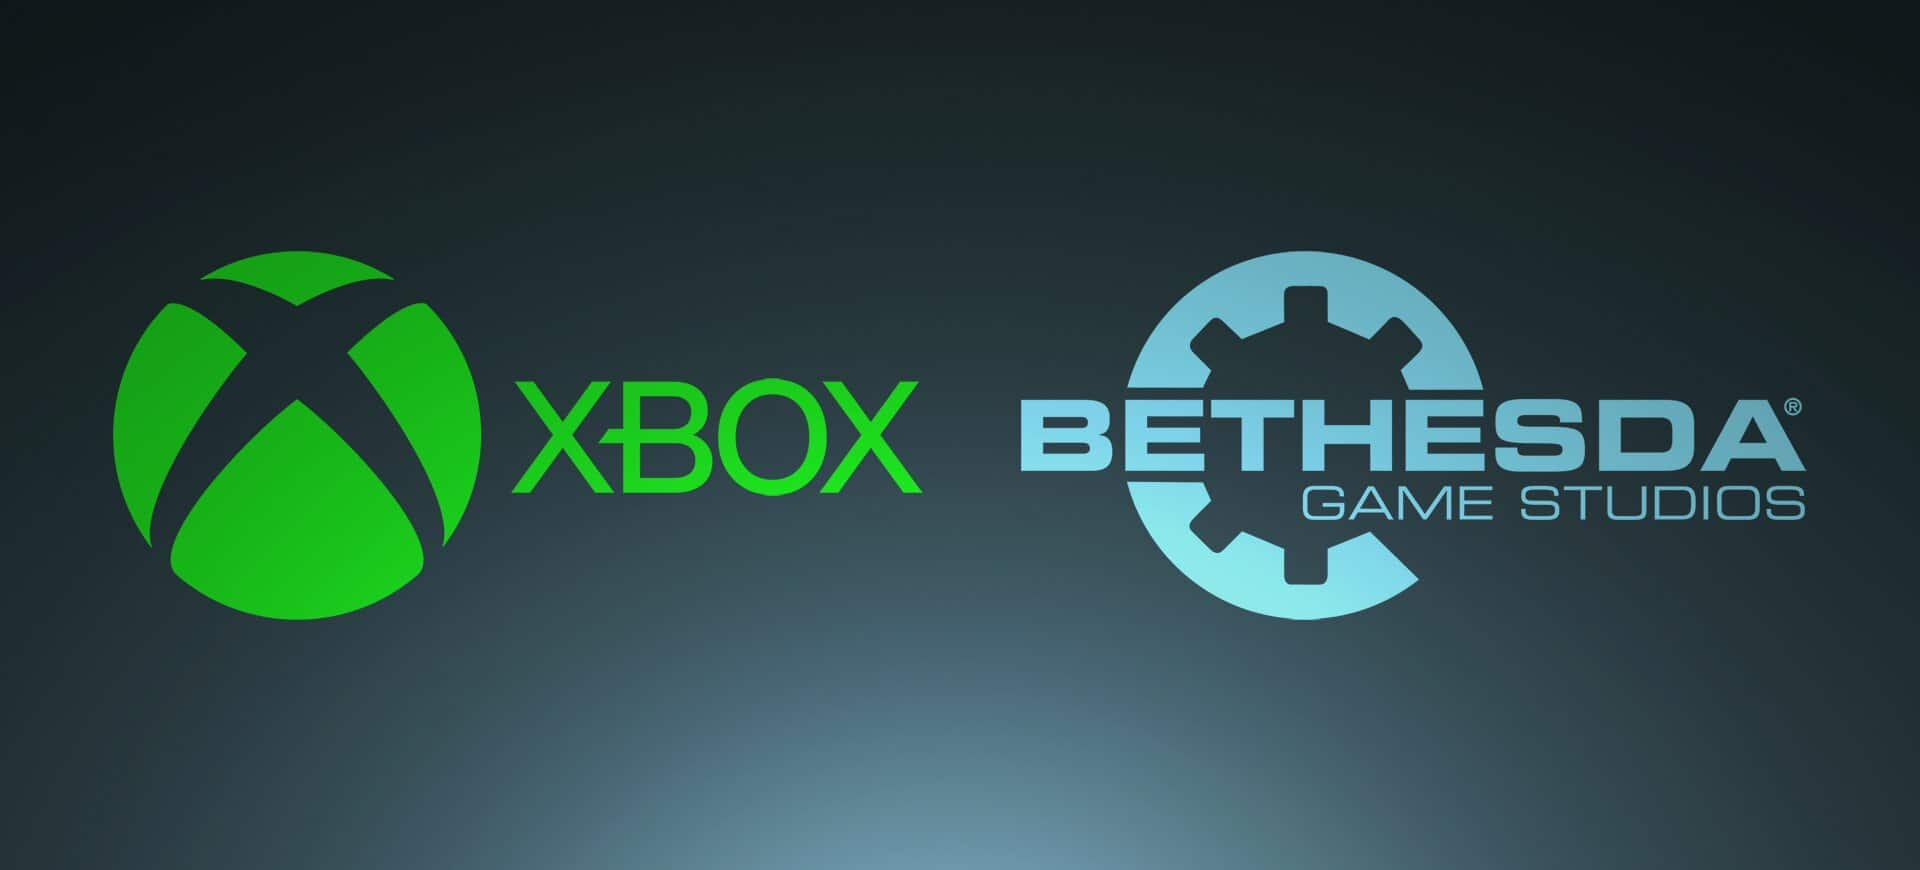 Rachat de Bethesda Game Studios par Microsoft